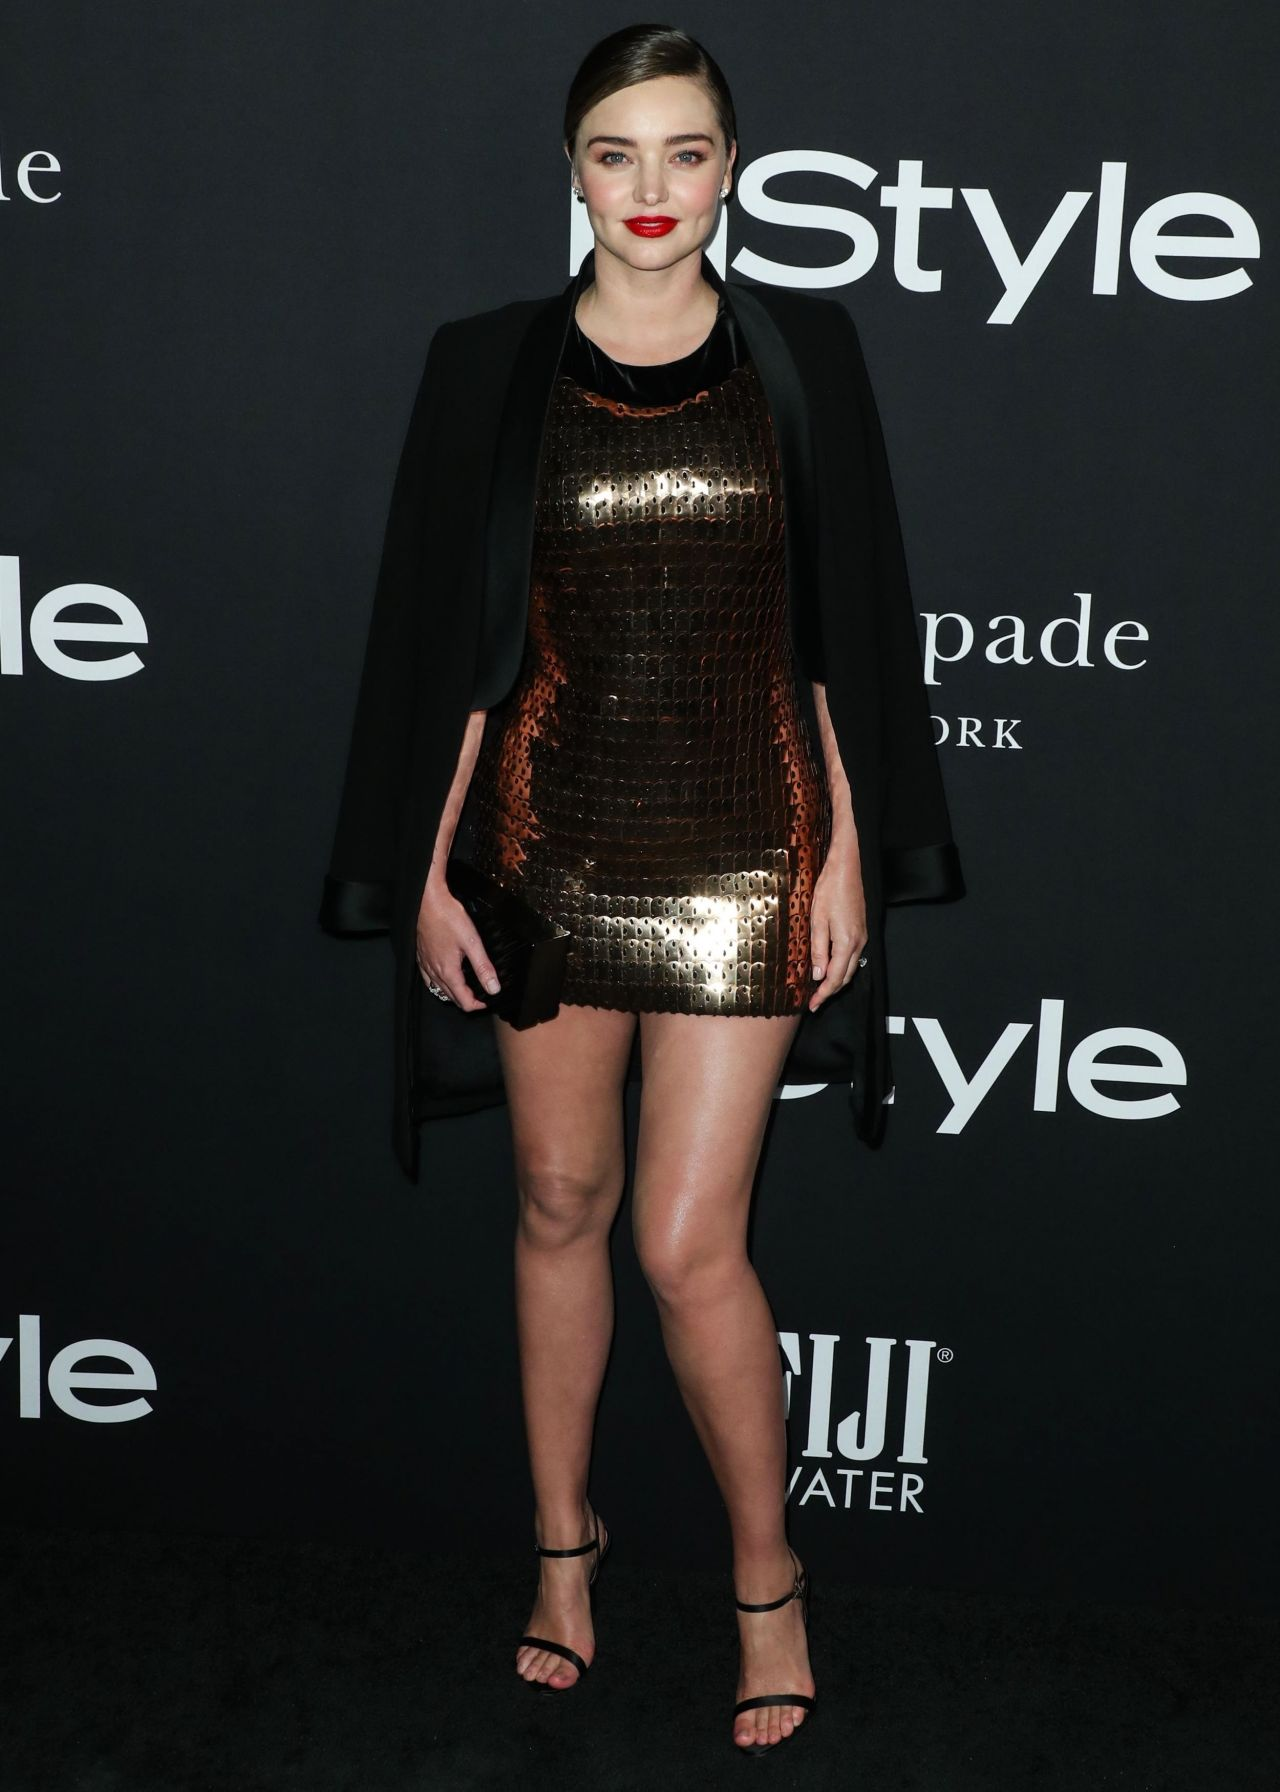 864605bcc2 Miranda Kerr photo gallery - 4788 best Miranda Kerr pics | Celebs ...